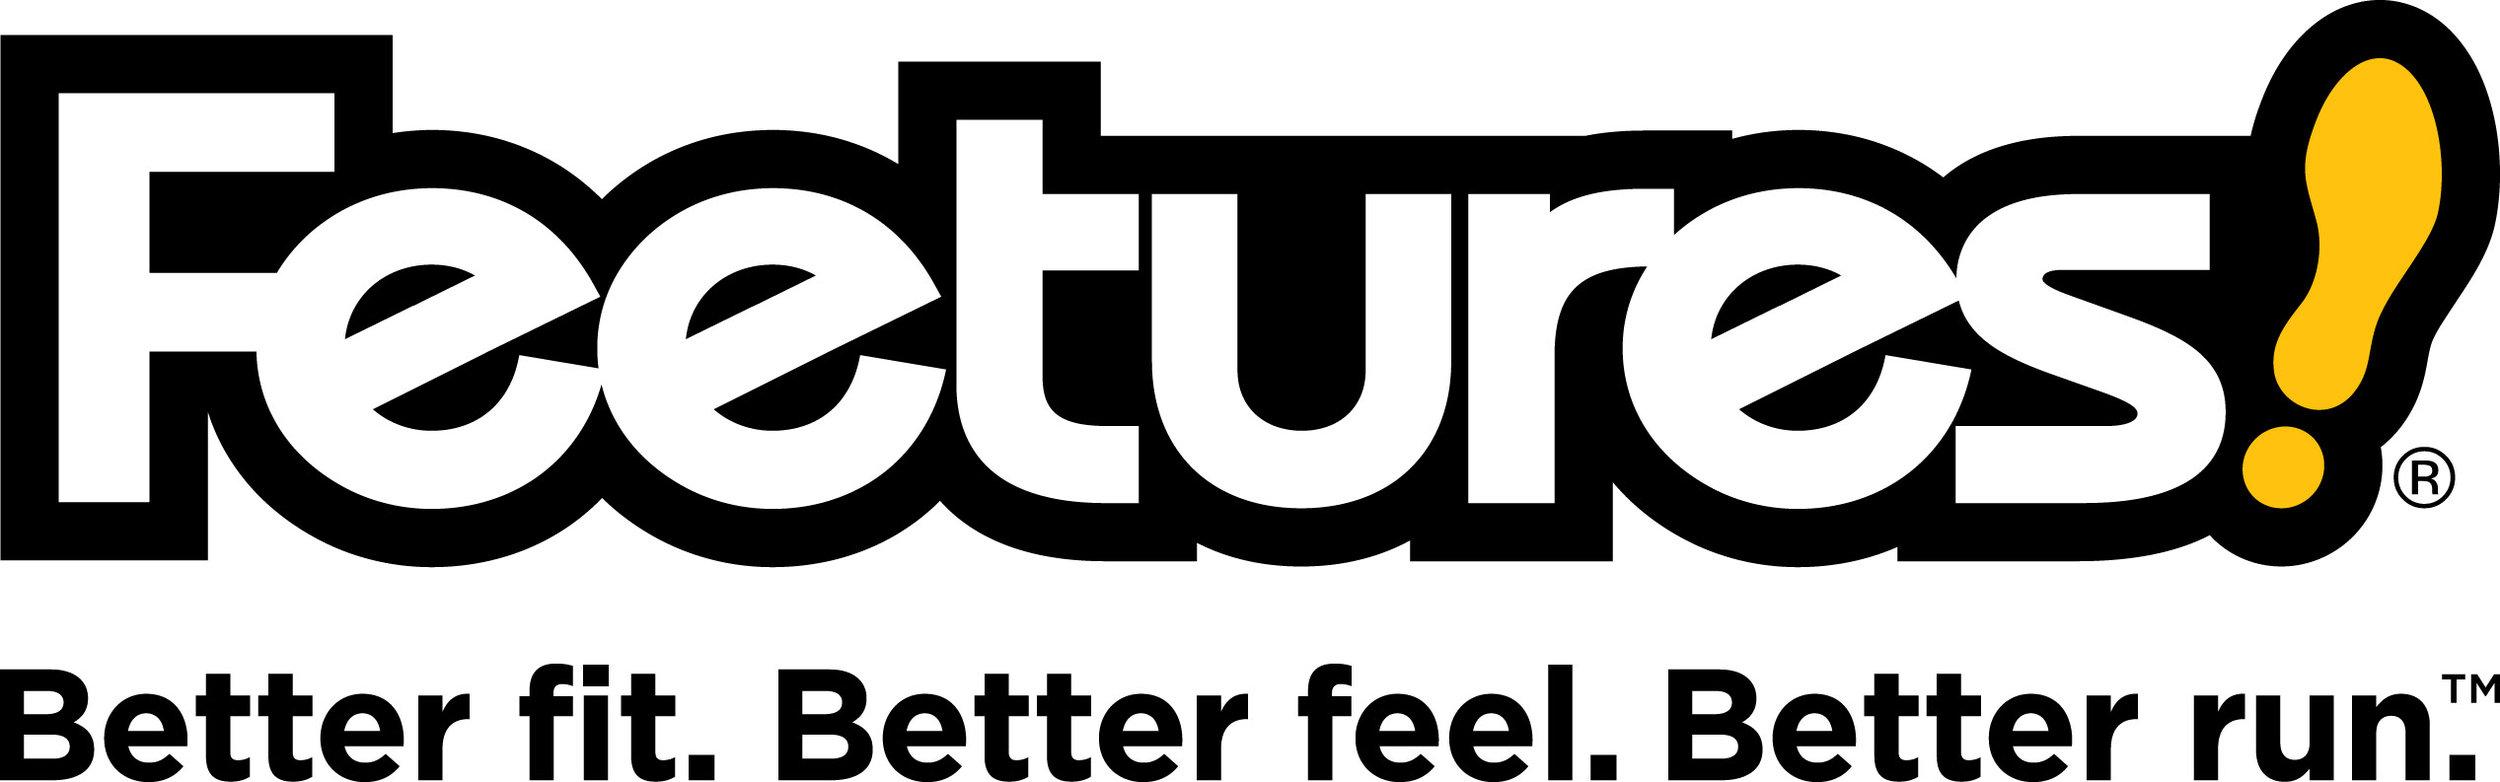 feetures-logo-and-tagline_2.jpg